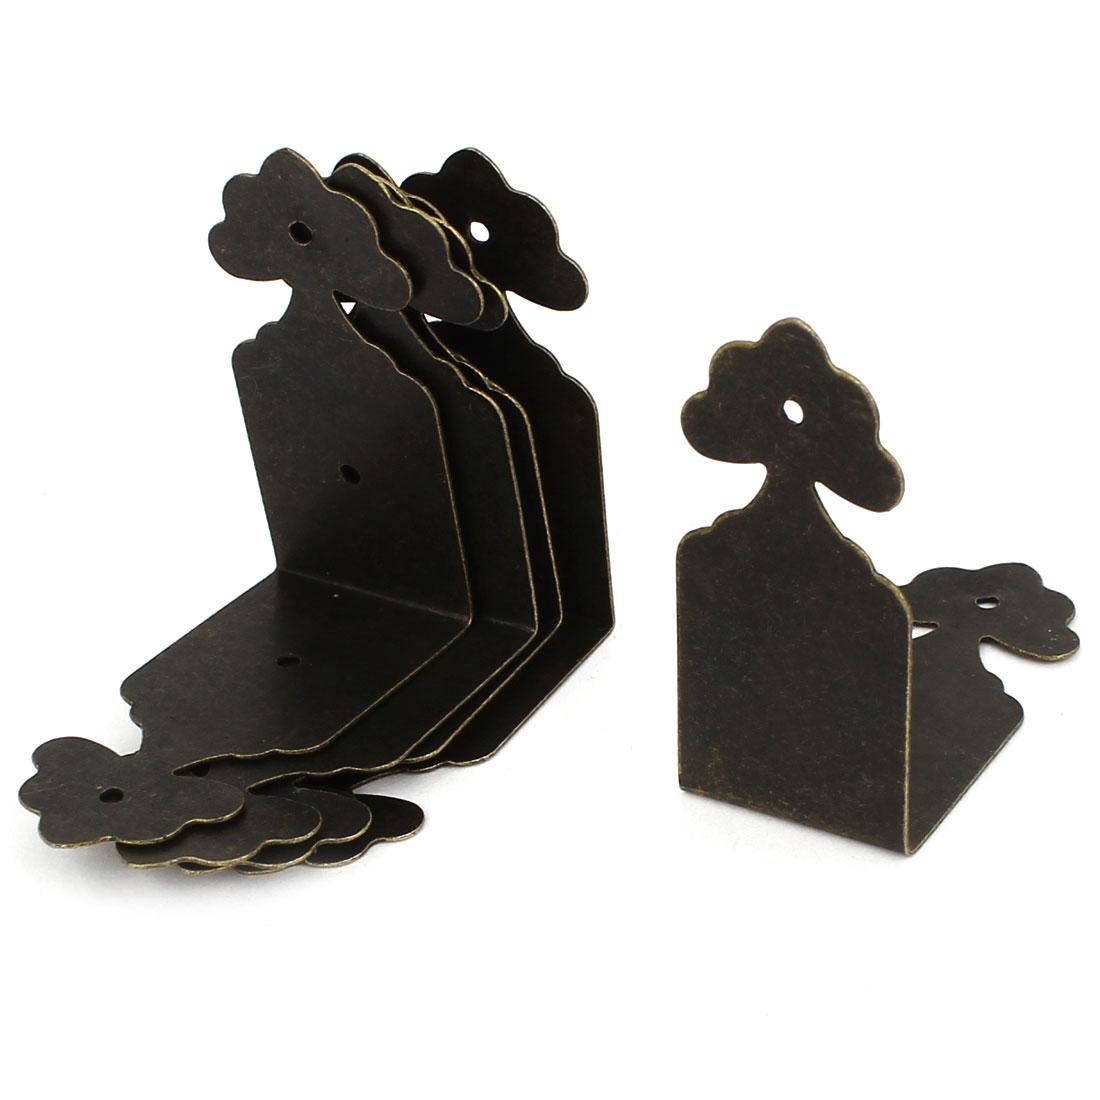 8pcs Right Angle Hardware Furniture Closet Cabinet Edge Corner Protector Bracket Bronze Tone